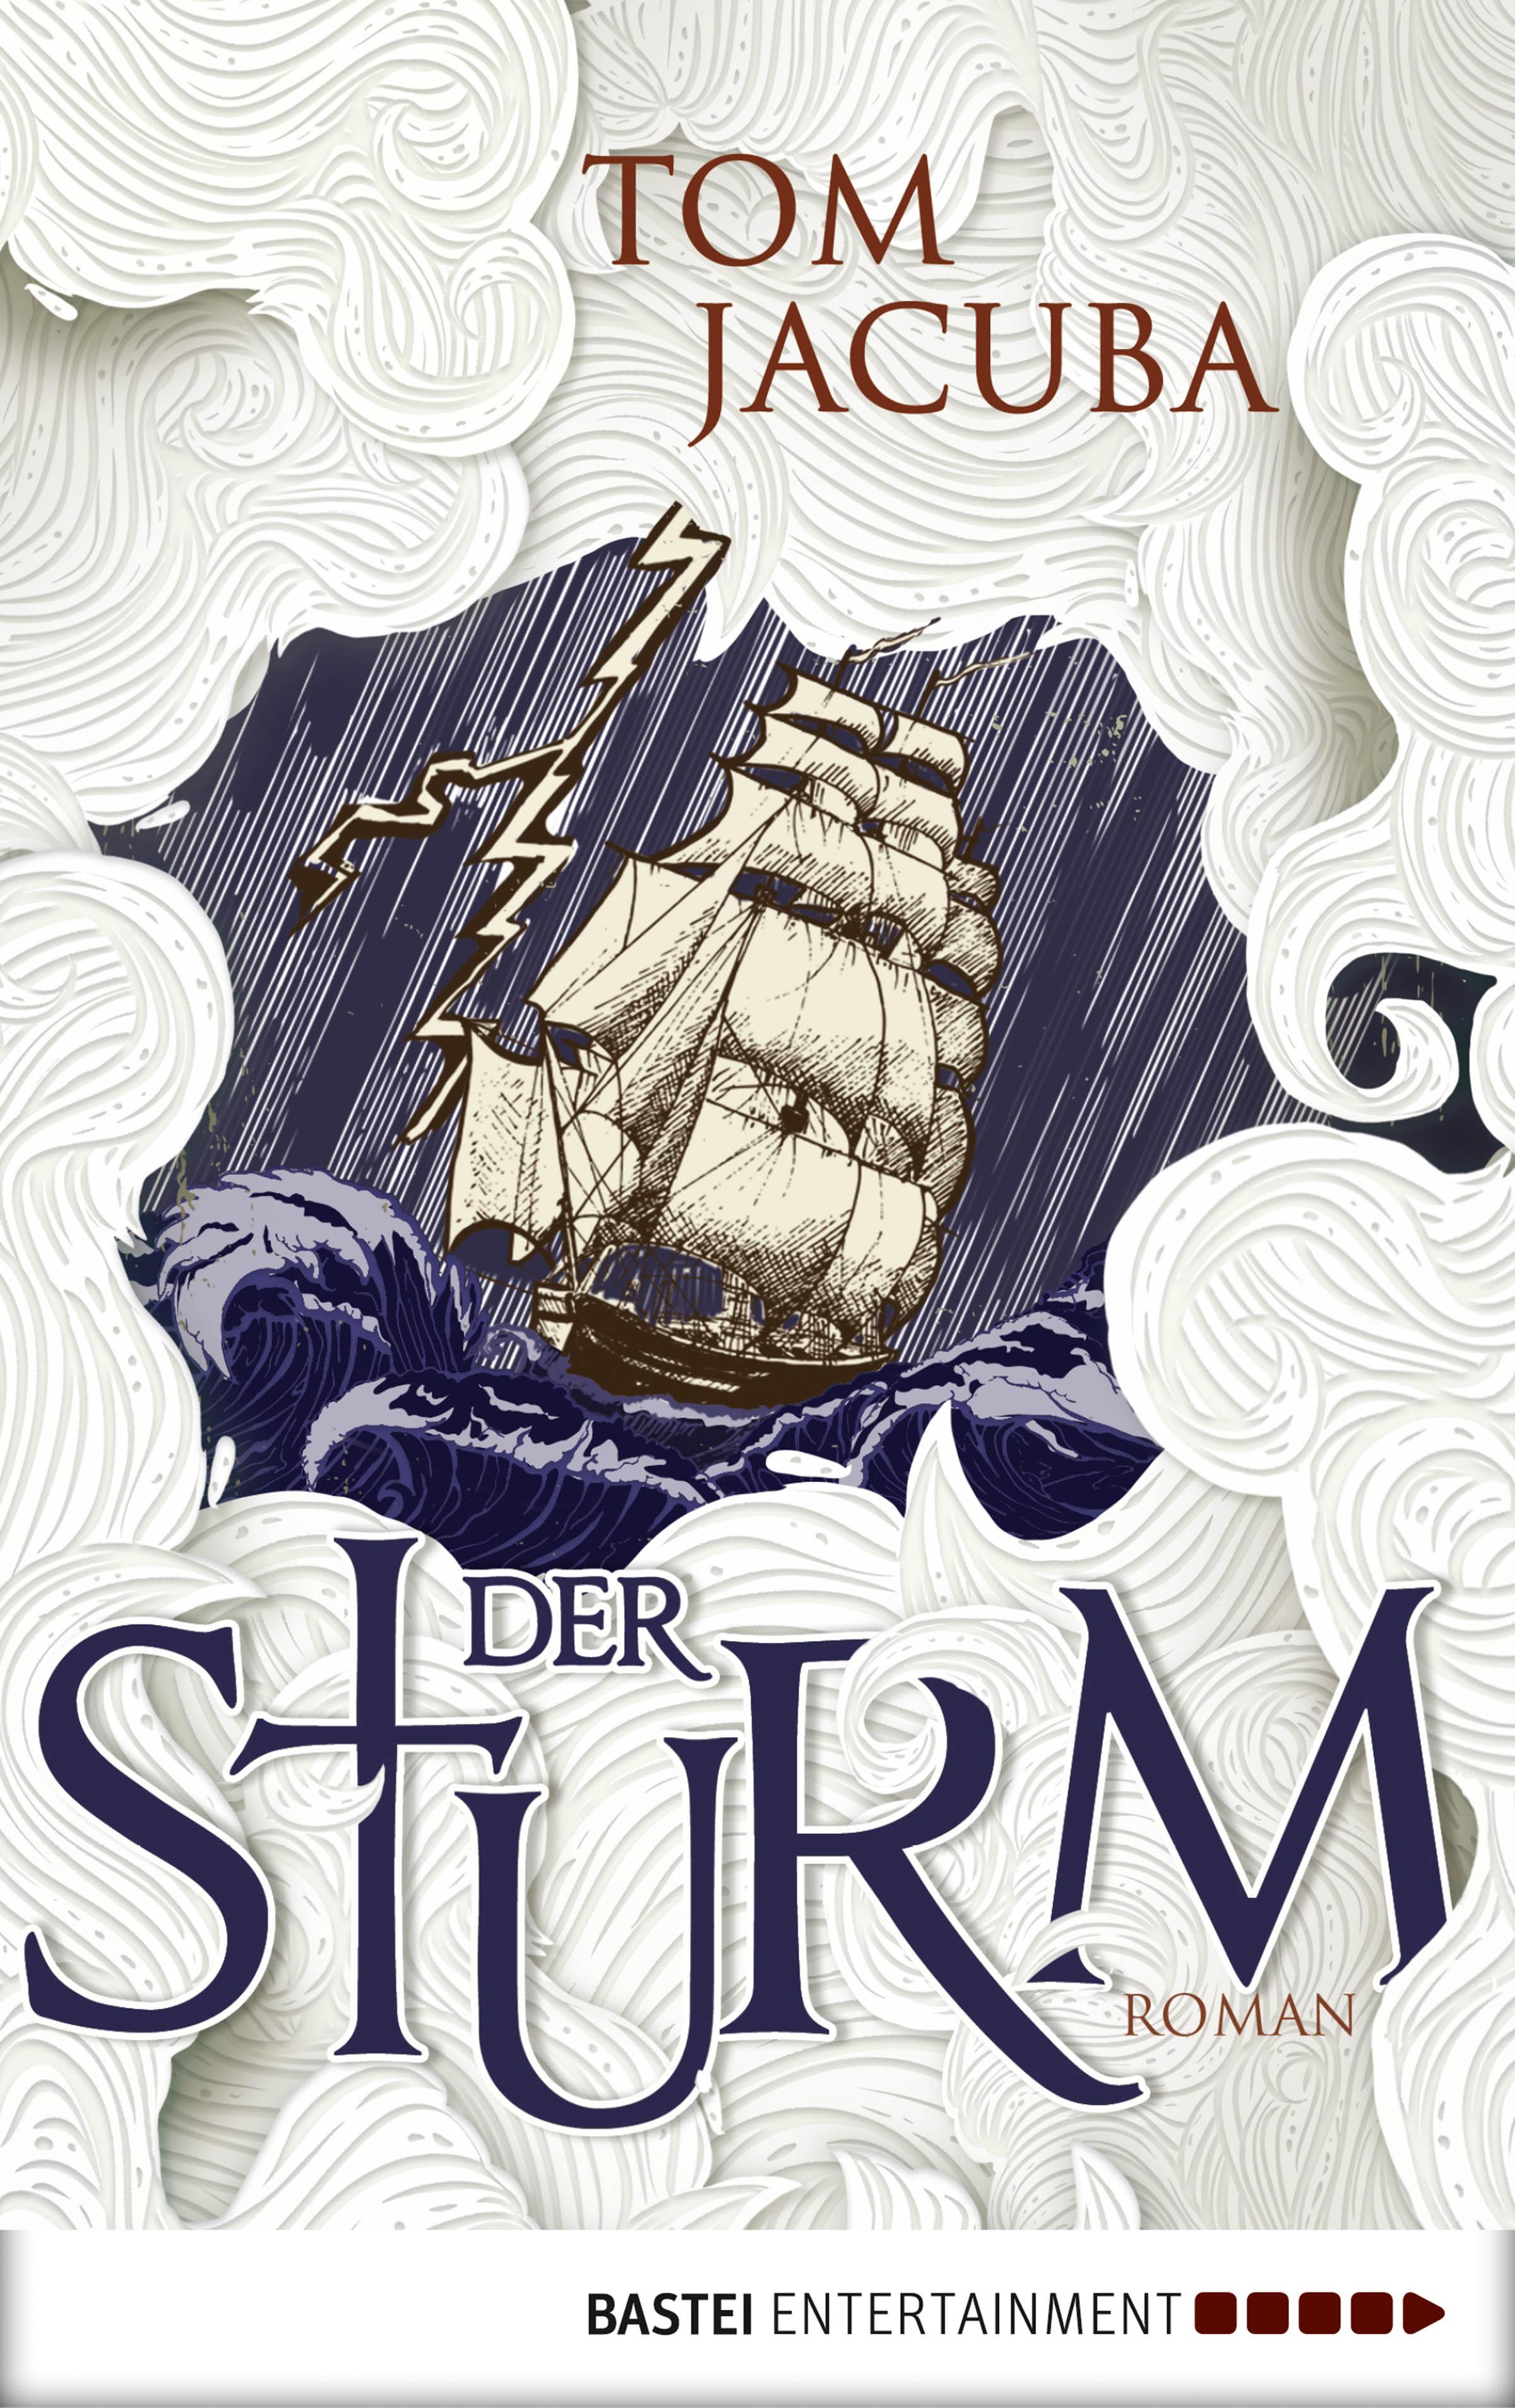 Der-Sturm_Tom-Jacuba.jpg